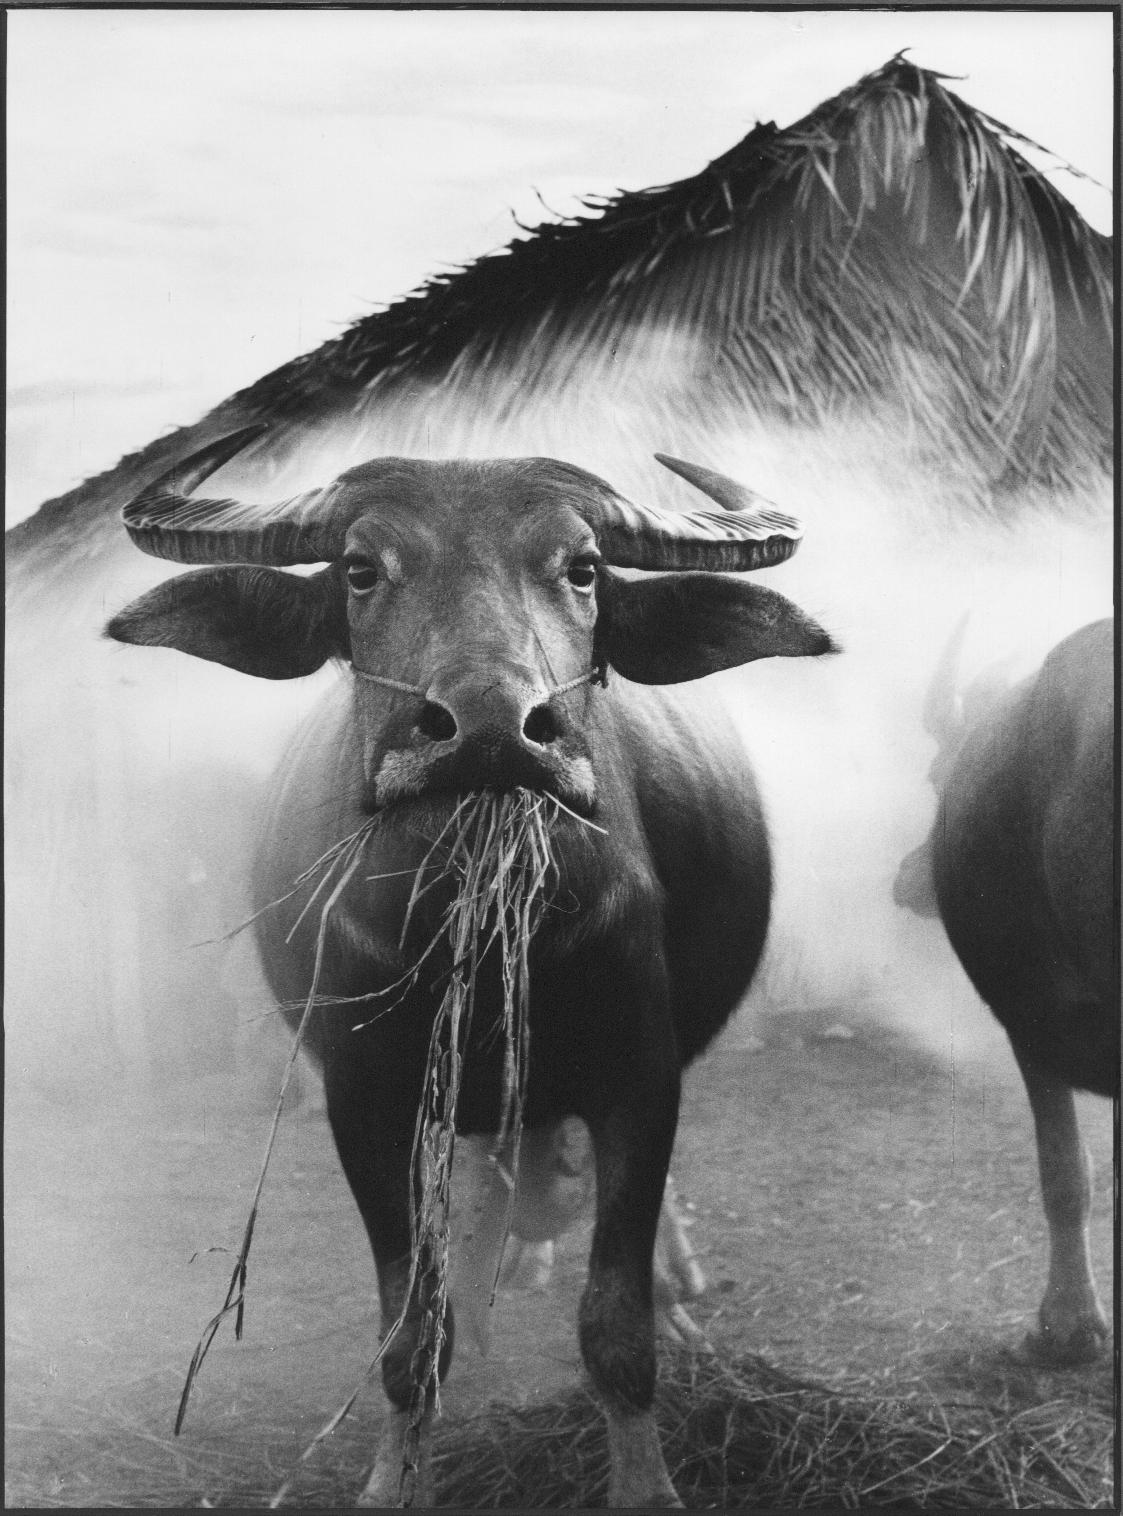 Chewing, Vietnam , 1962